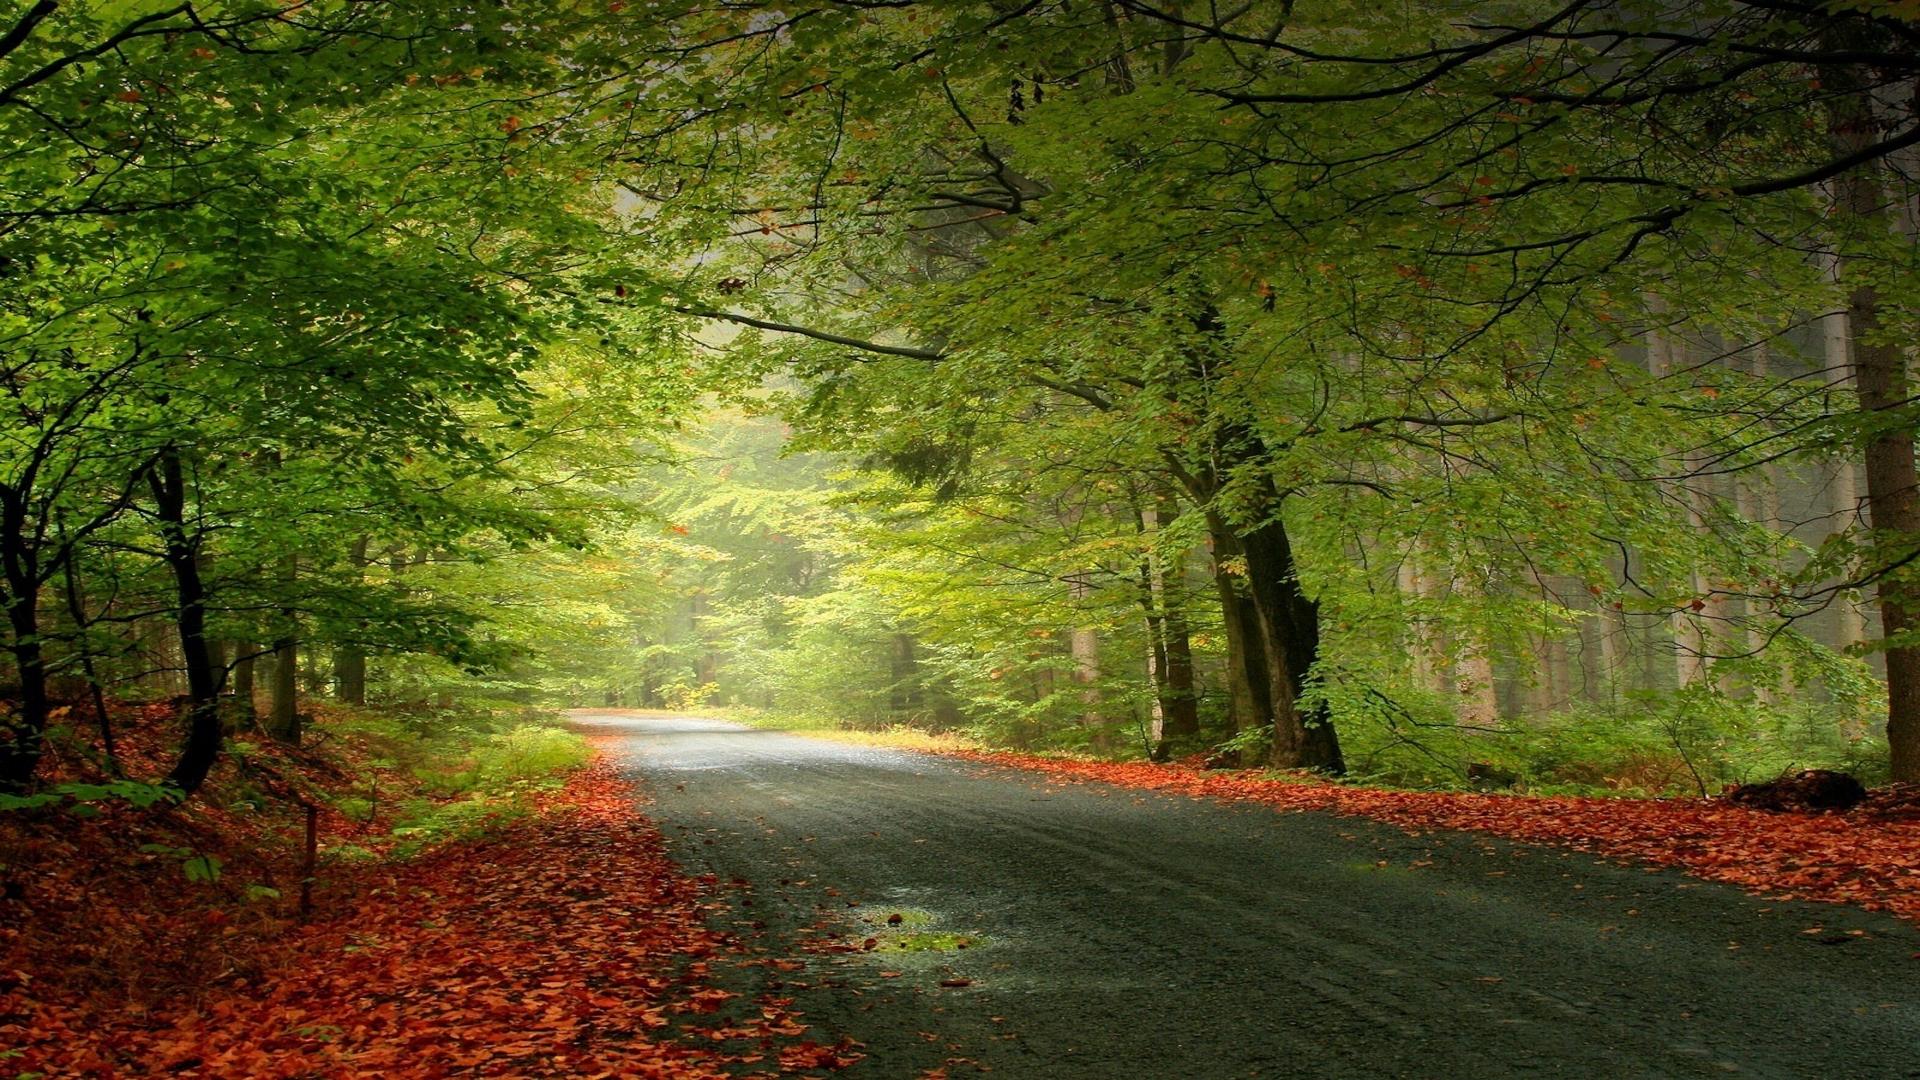 6-autumn-nature-sandbox-images_2053316.jpg